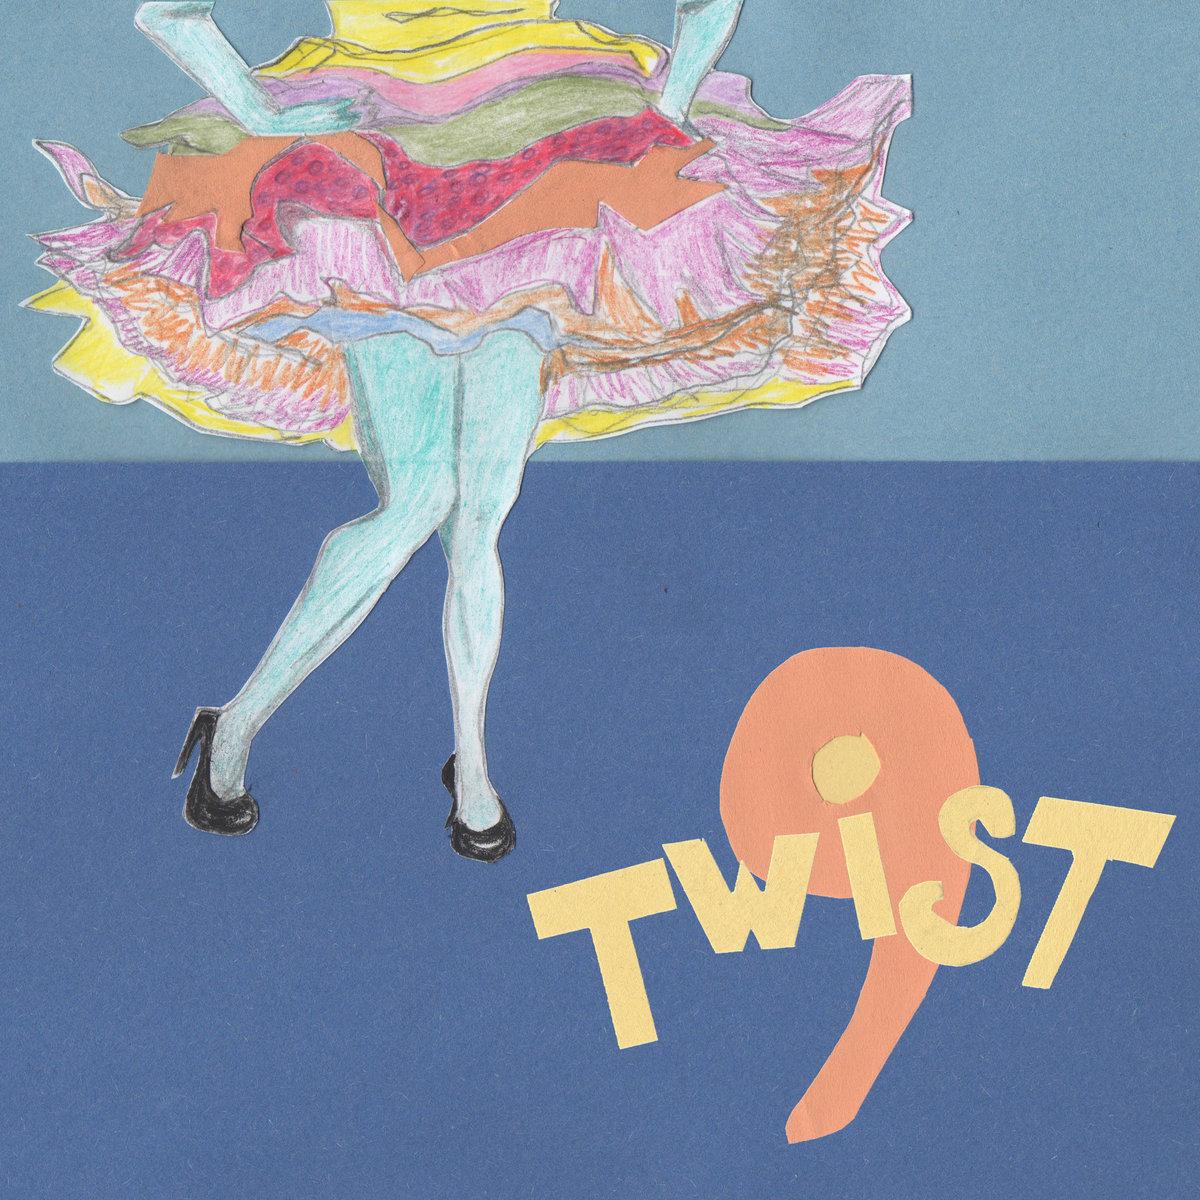 Twist No. 9 by Morricone 90